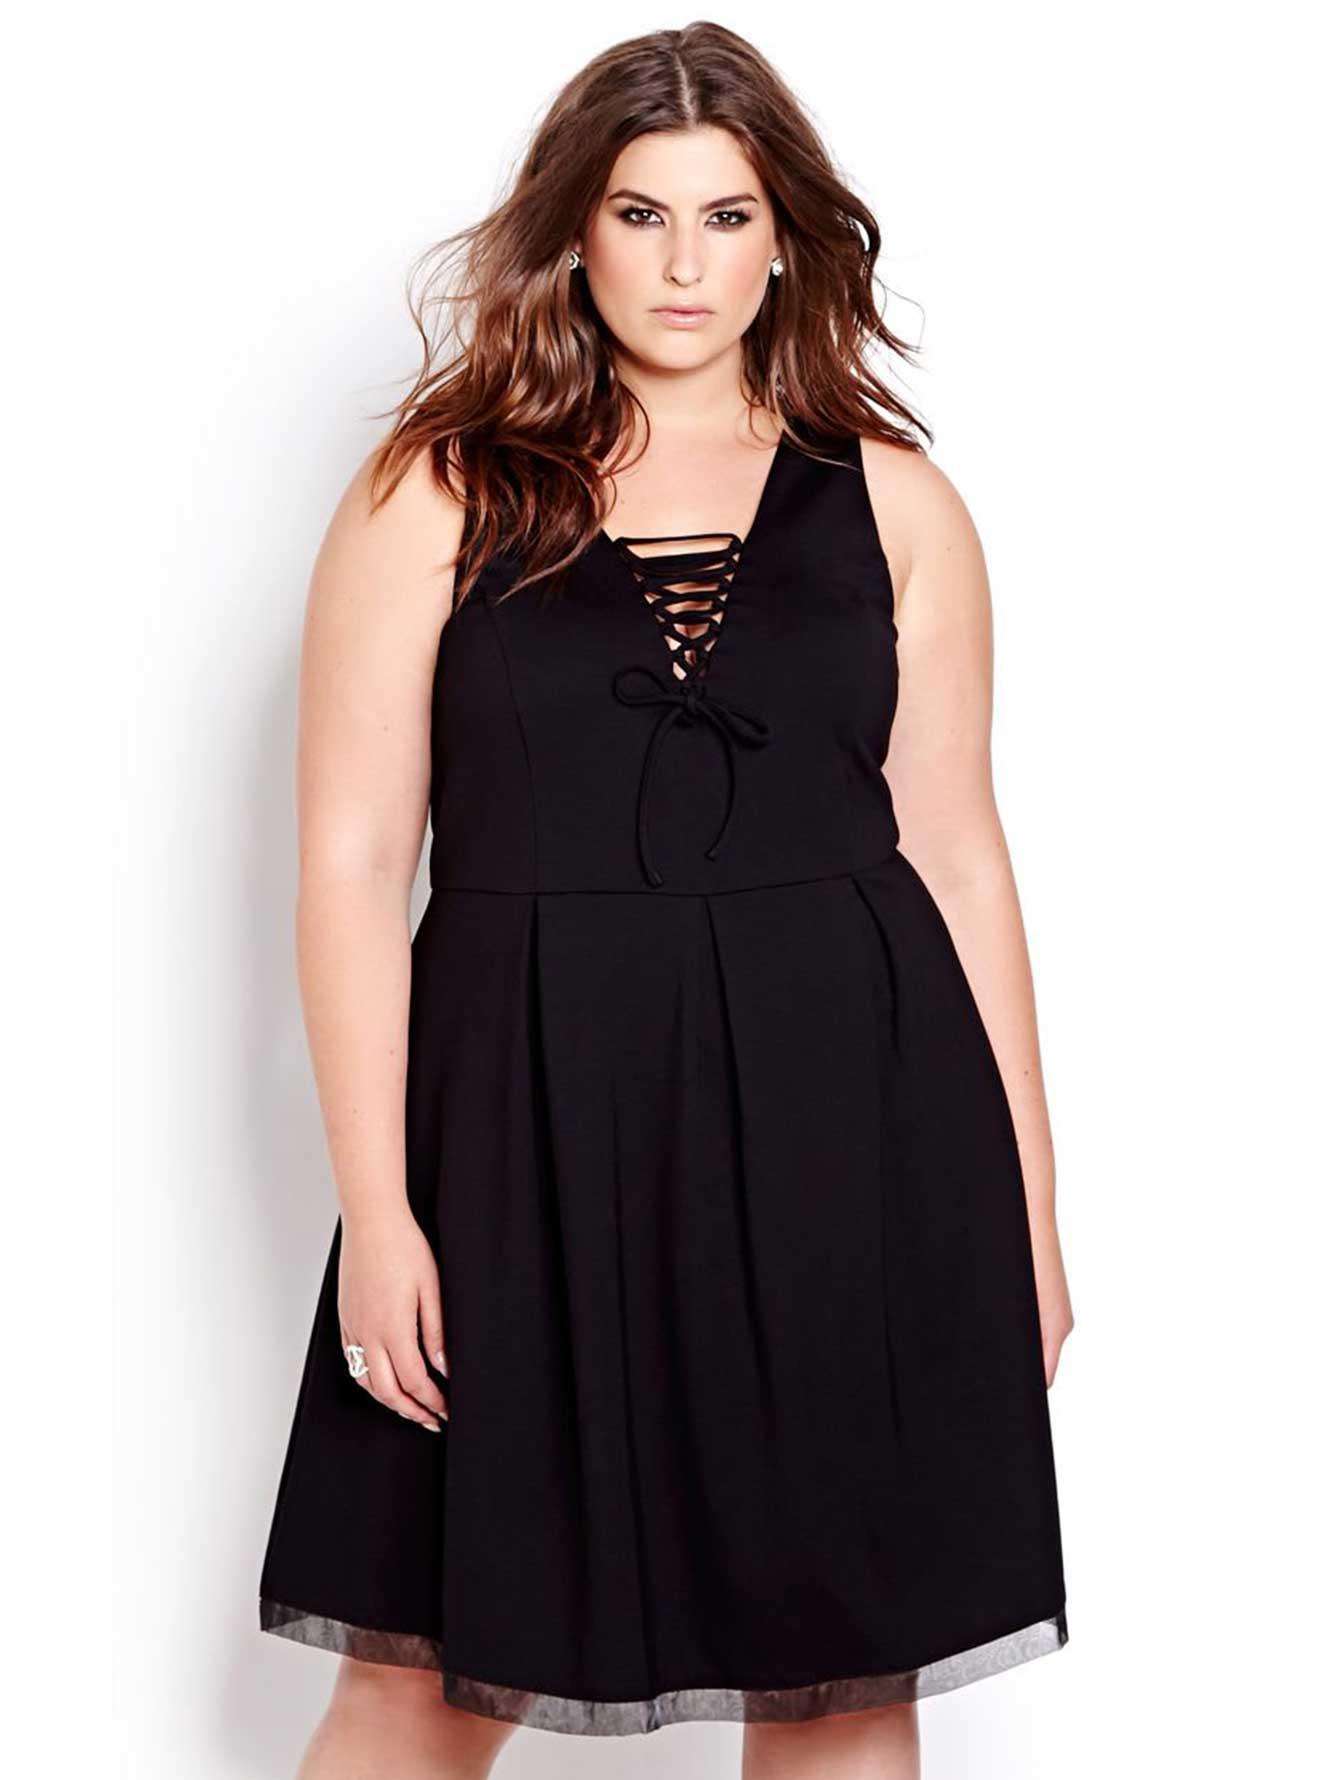 82db5a80169c7 L&L Sleeveless Lace Up Dress | Addition Elle